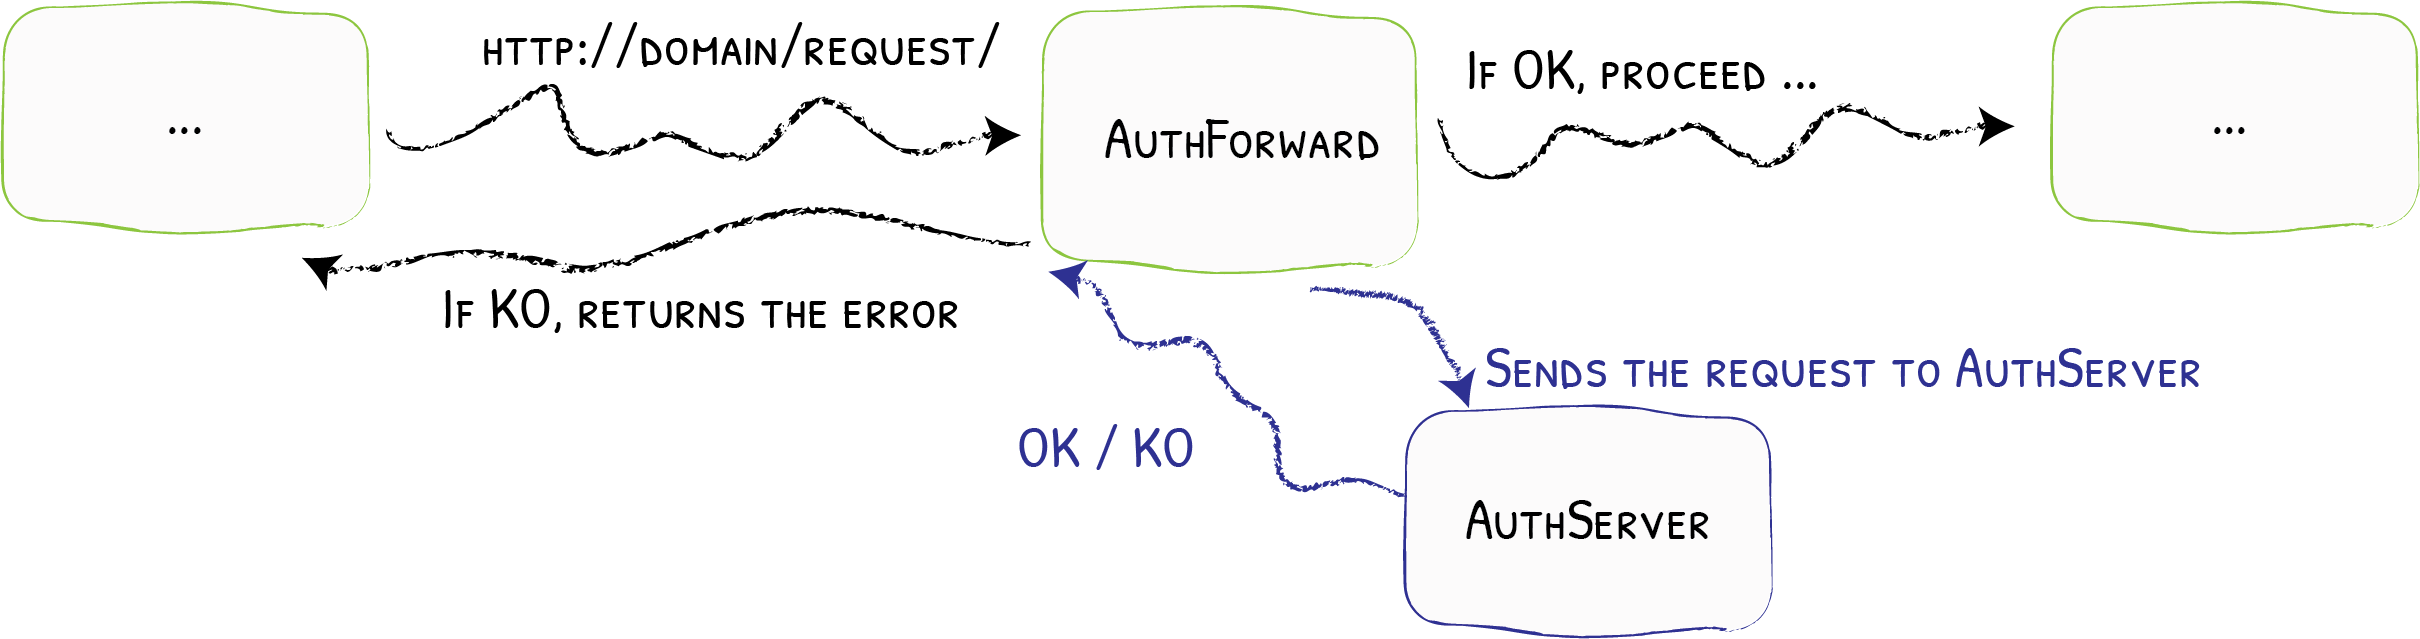 ForwardAuth - Traefik